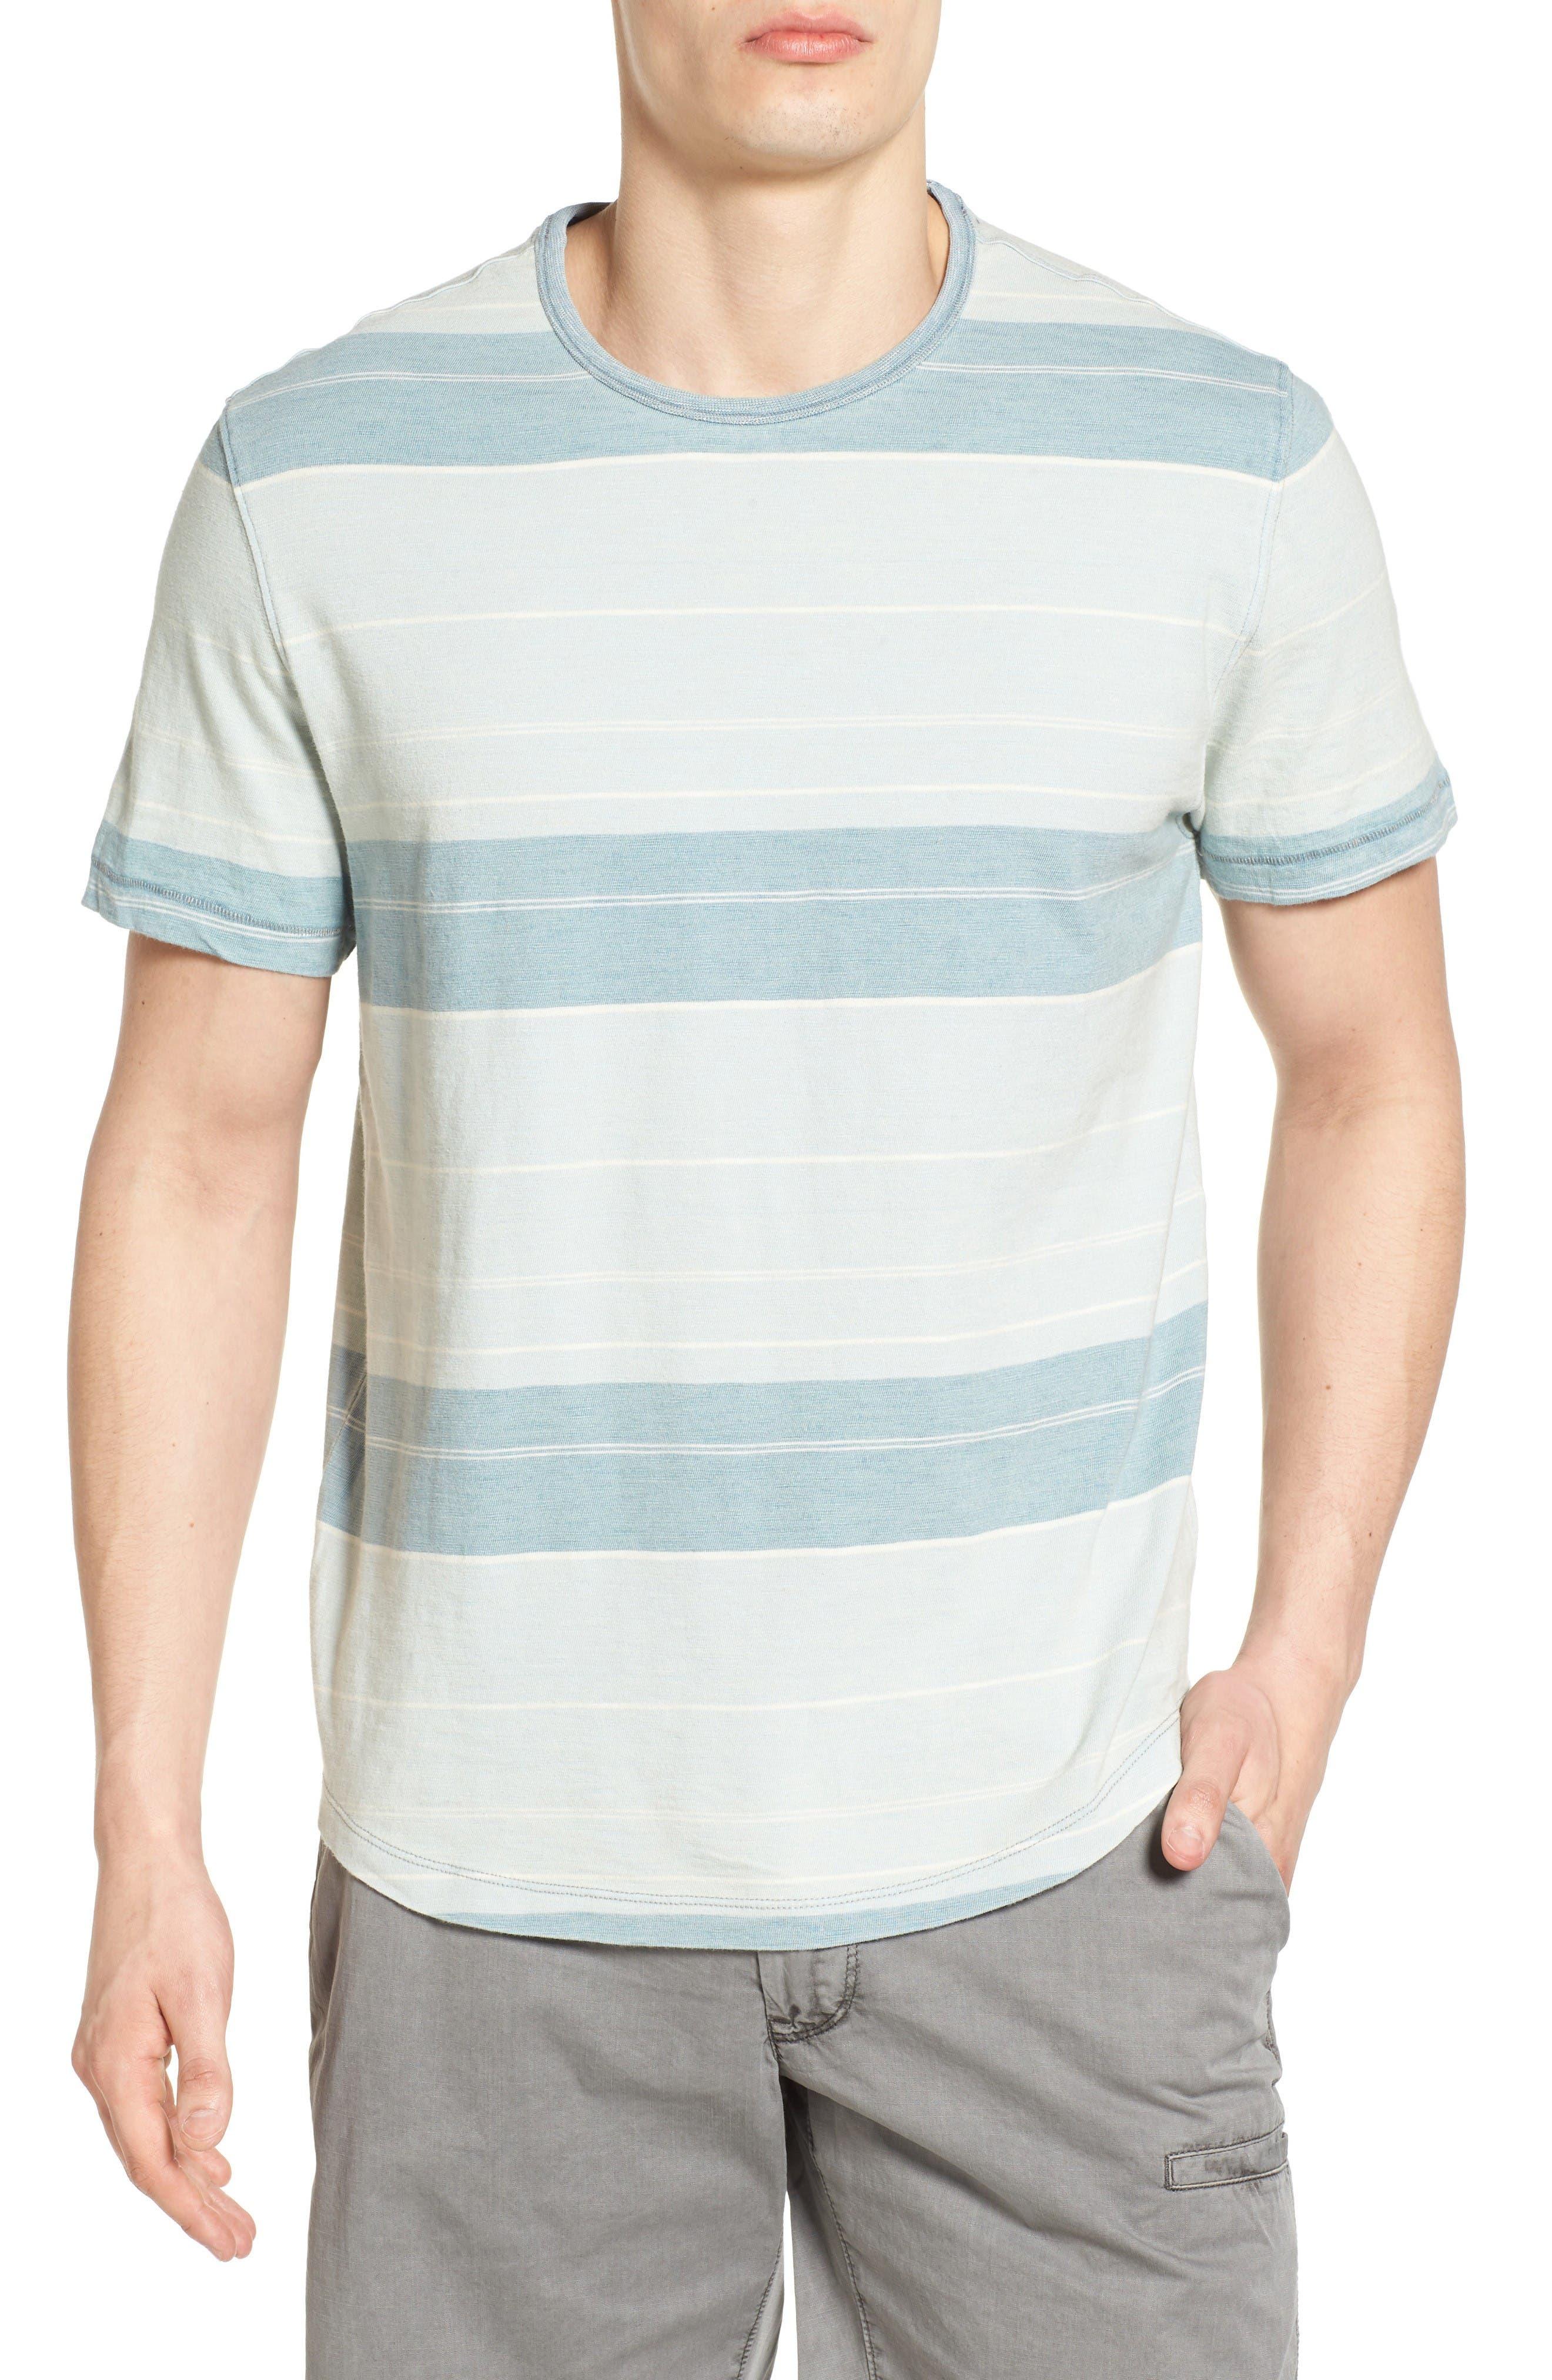 Jeremiah Tully Indigo Stripe T-Shirt